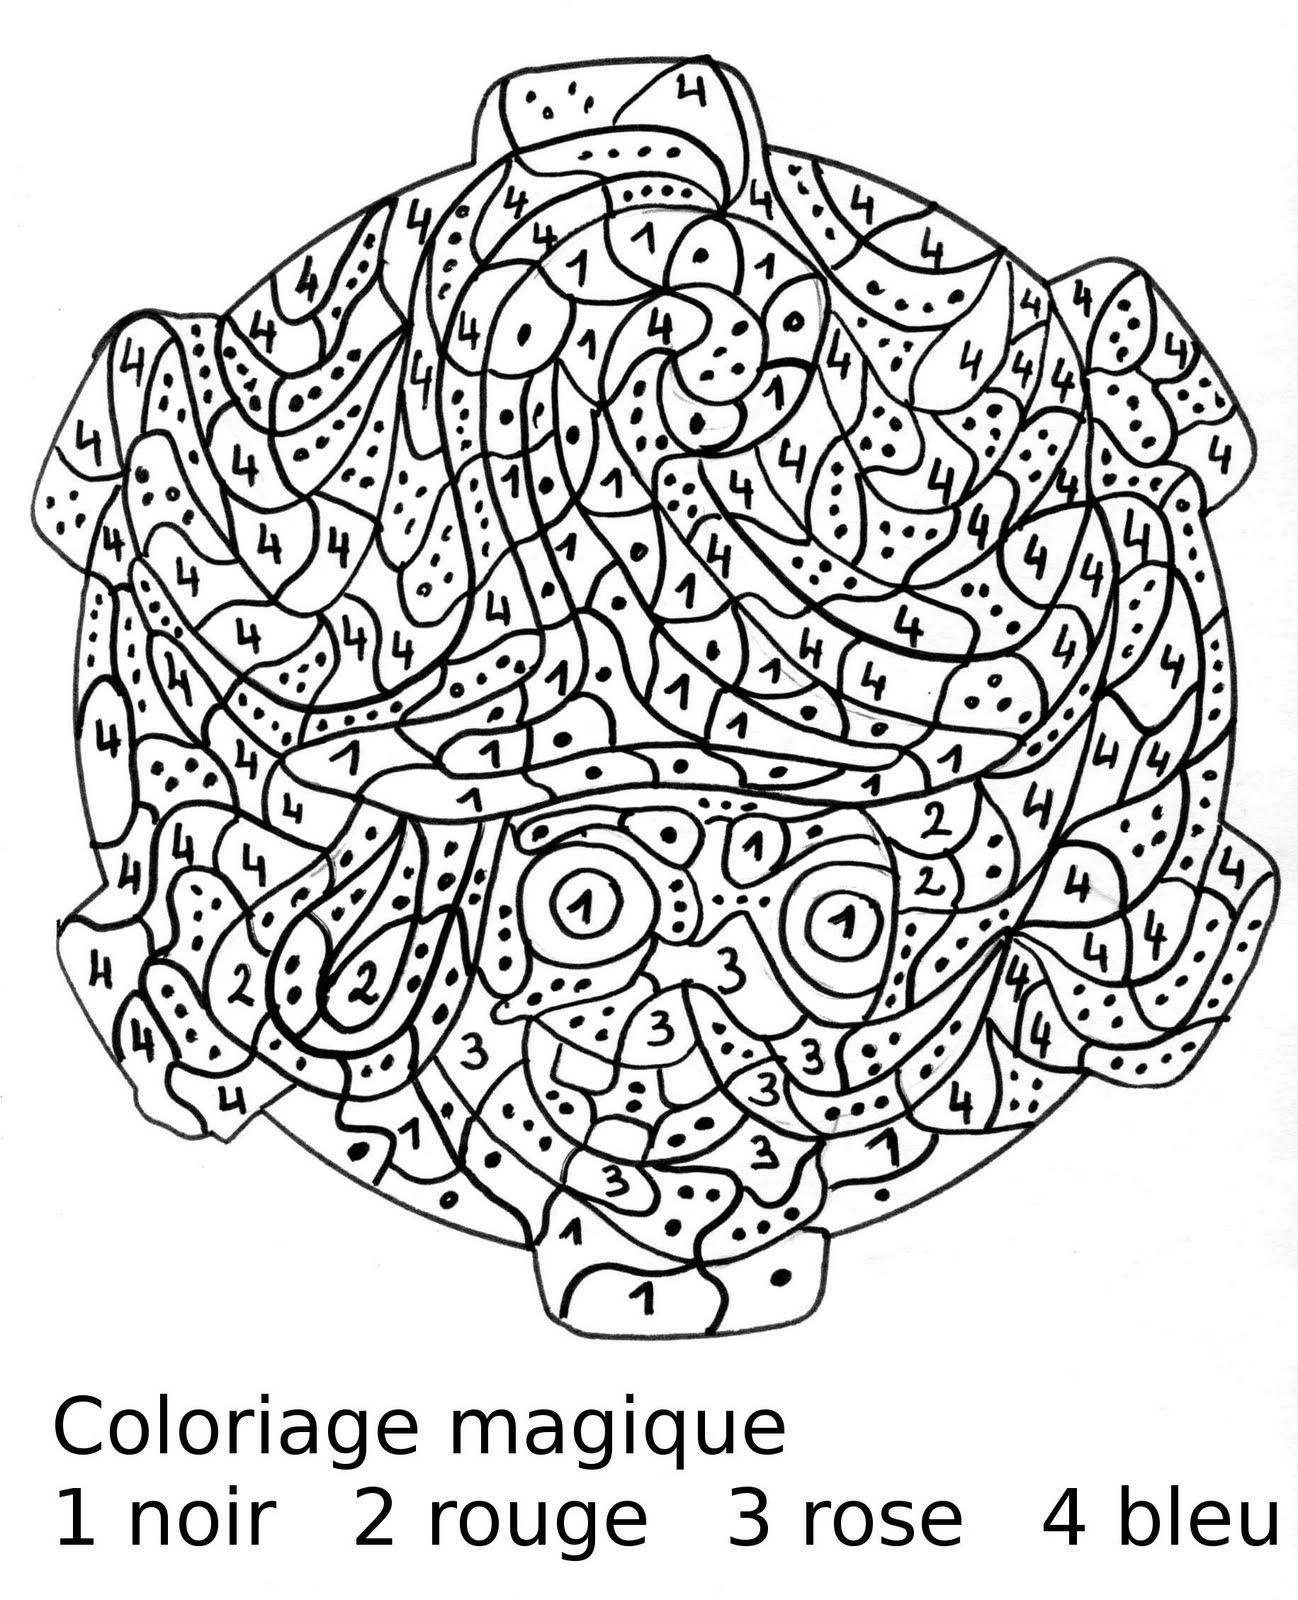 Coloriage Magique Cp Gs.Coloriage Magique Cp A Colorier Dessin A Imprimer Color